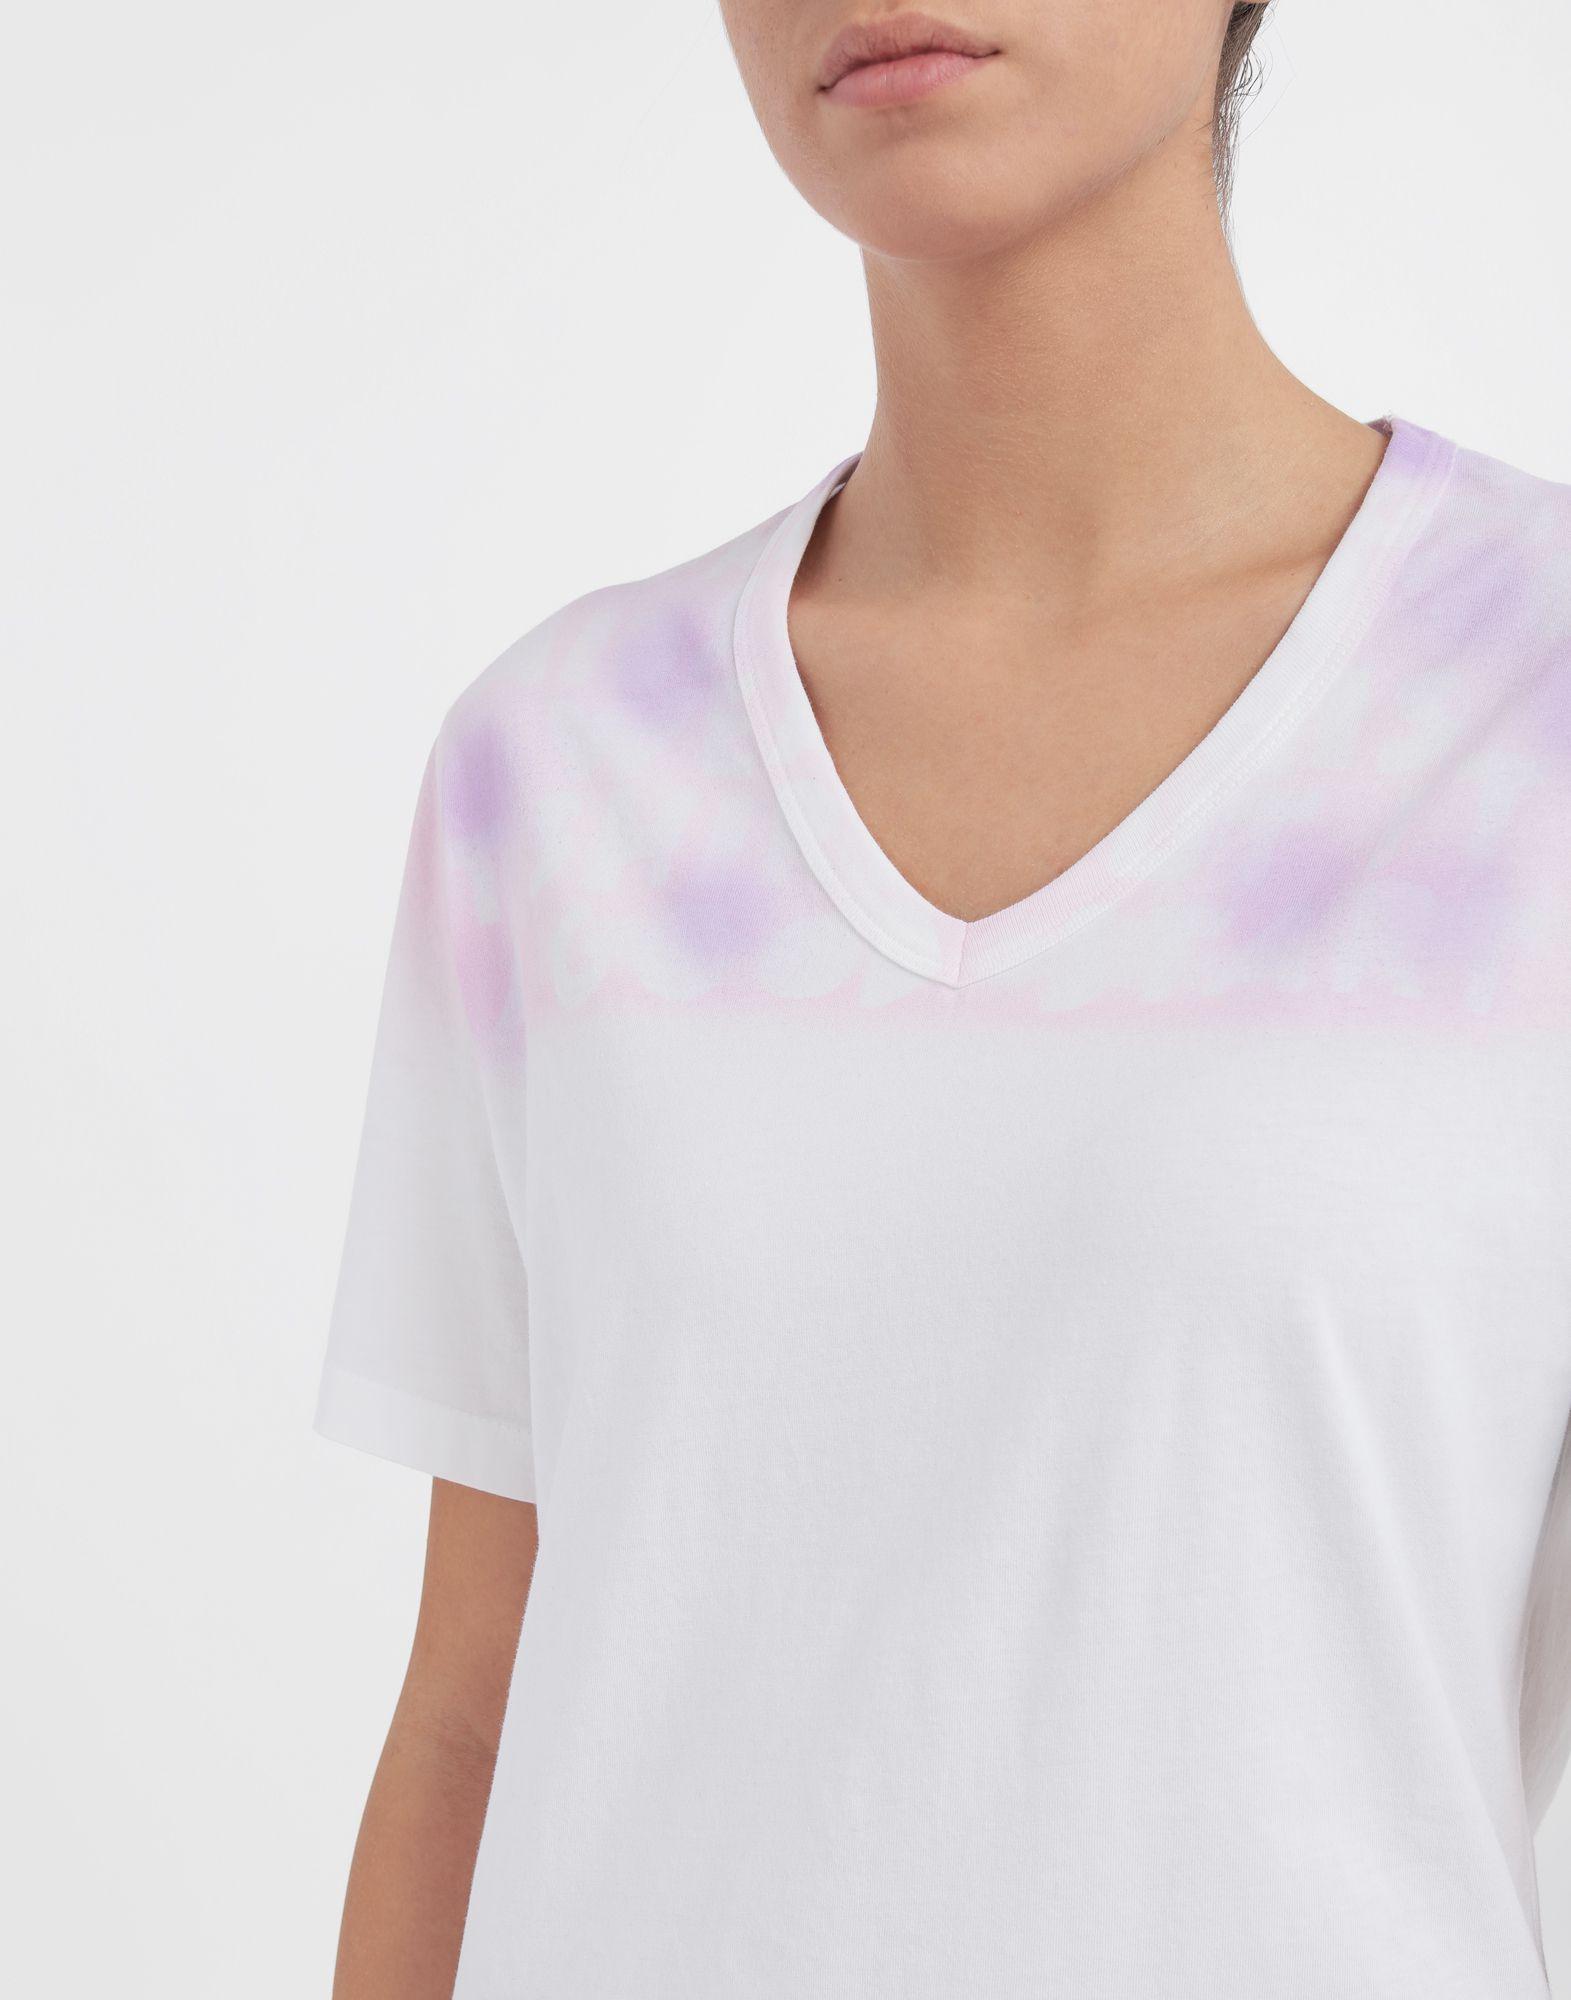 MM6 MAISON MARGIELA AIDS Charity tie-dye T-shirt Short sleeve t-shirt Woman a